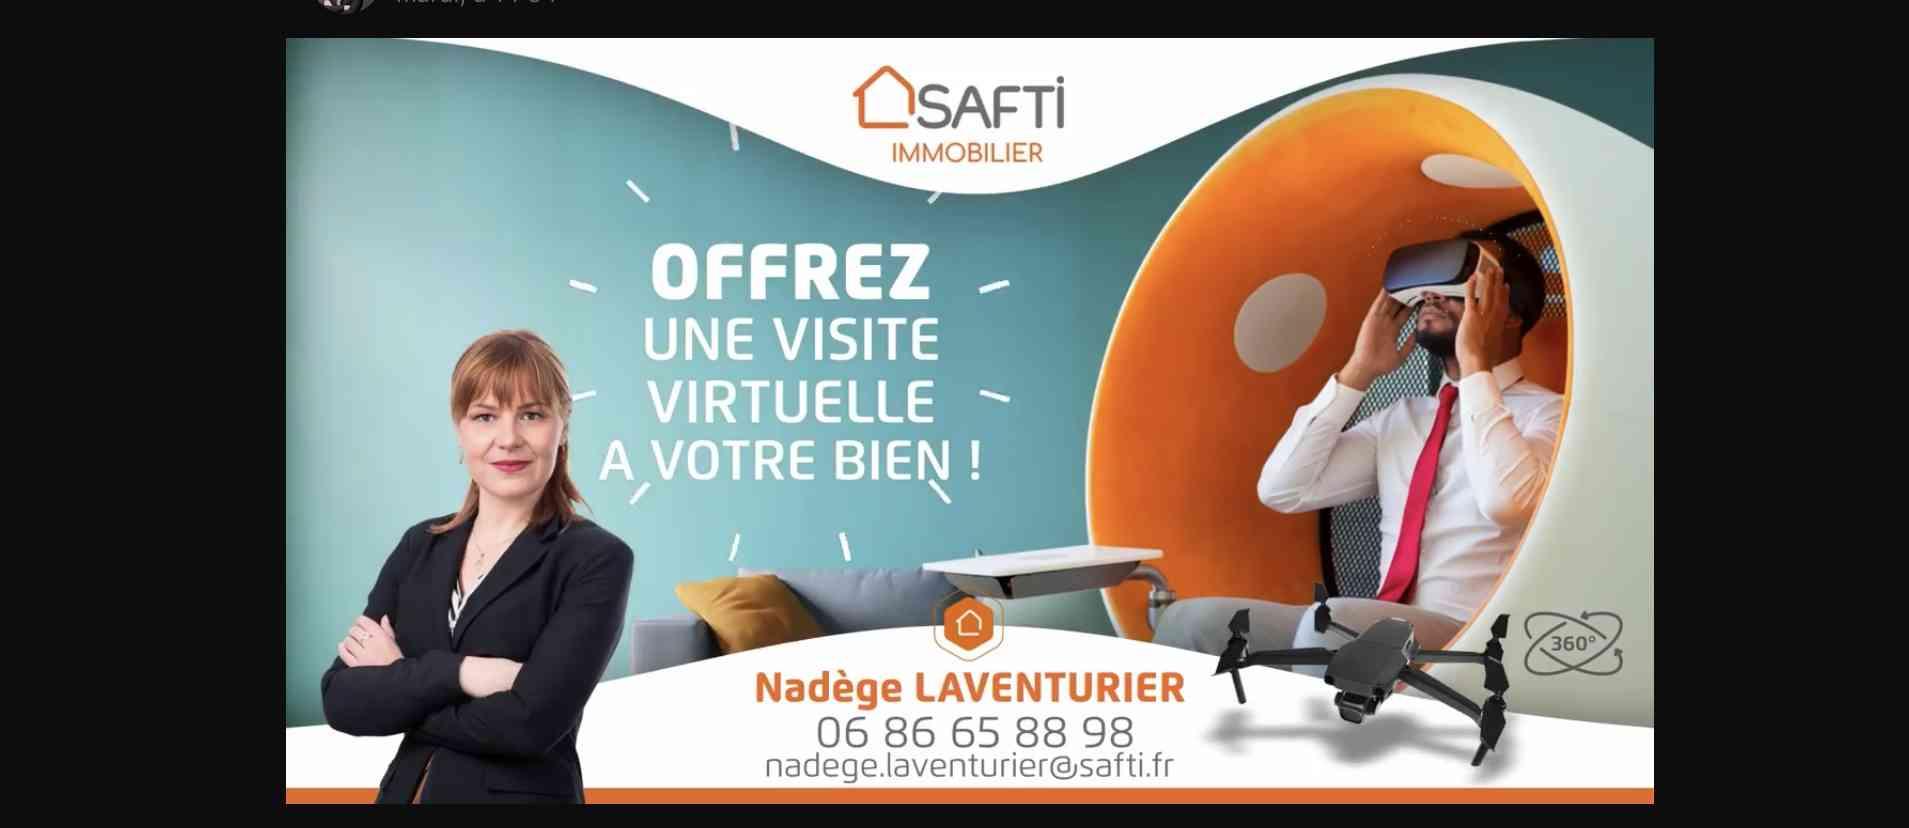 Nadège Laventurier Safti-immo   Ajaccio France   visite virtuelle 360 3D VR